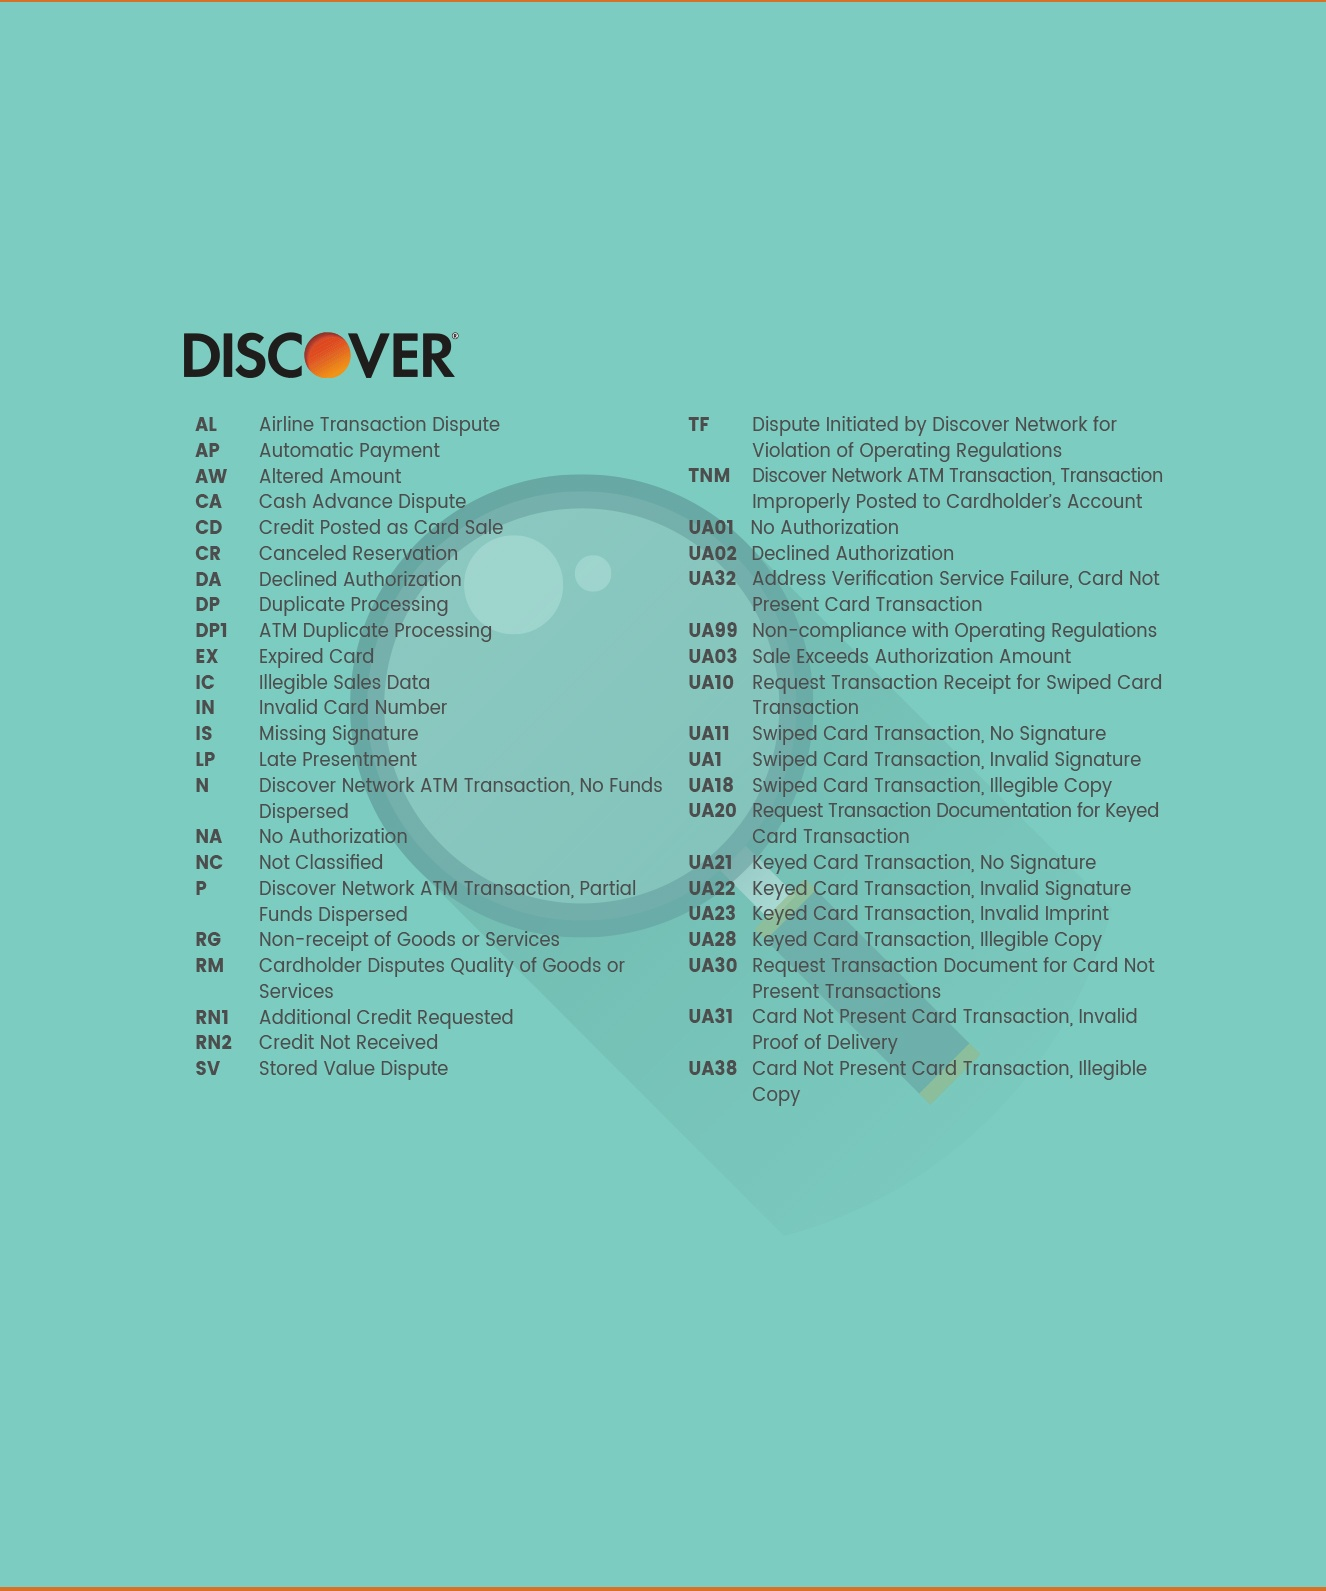 discover-reason-codes